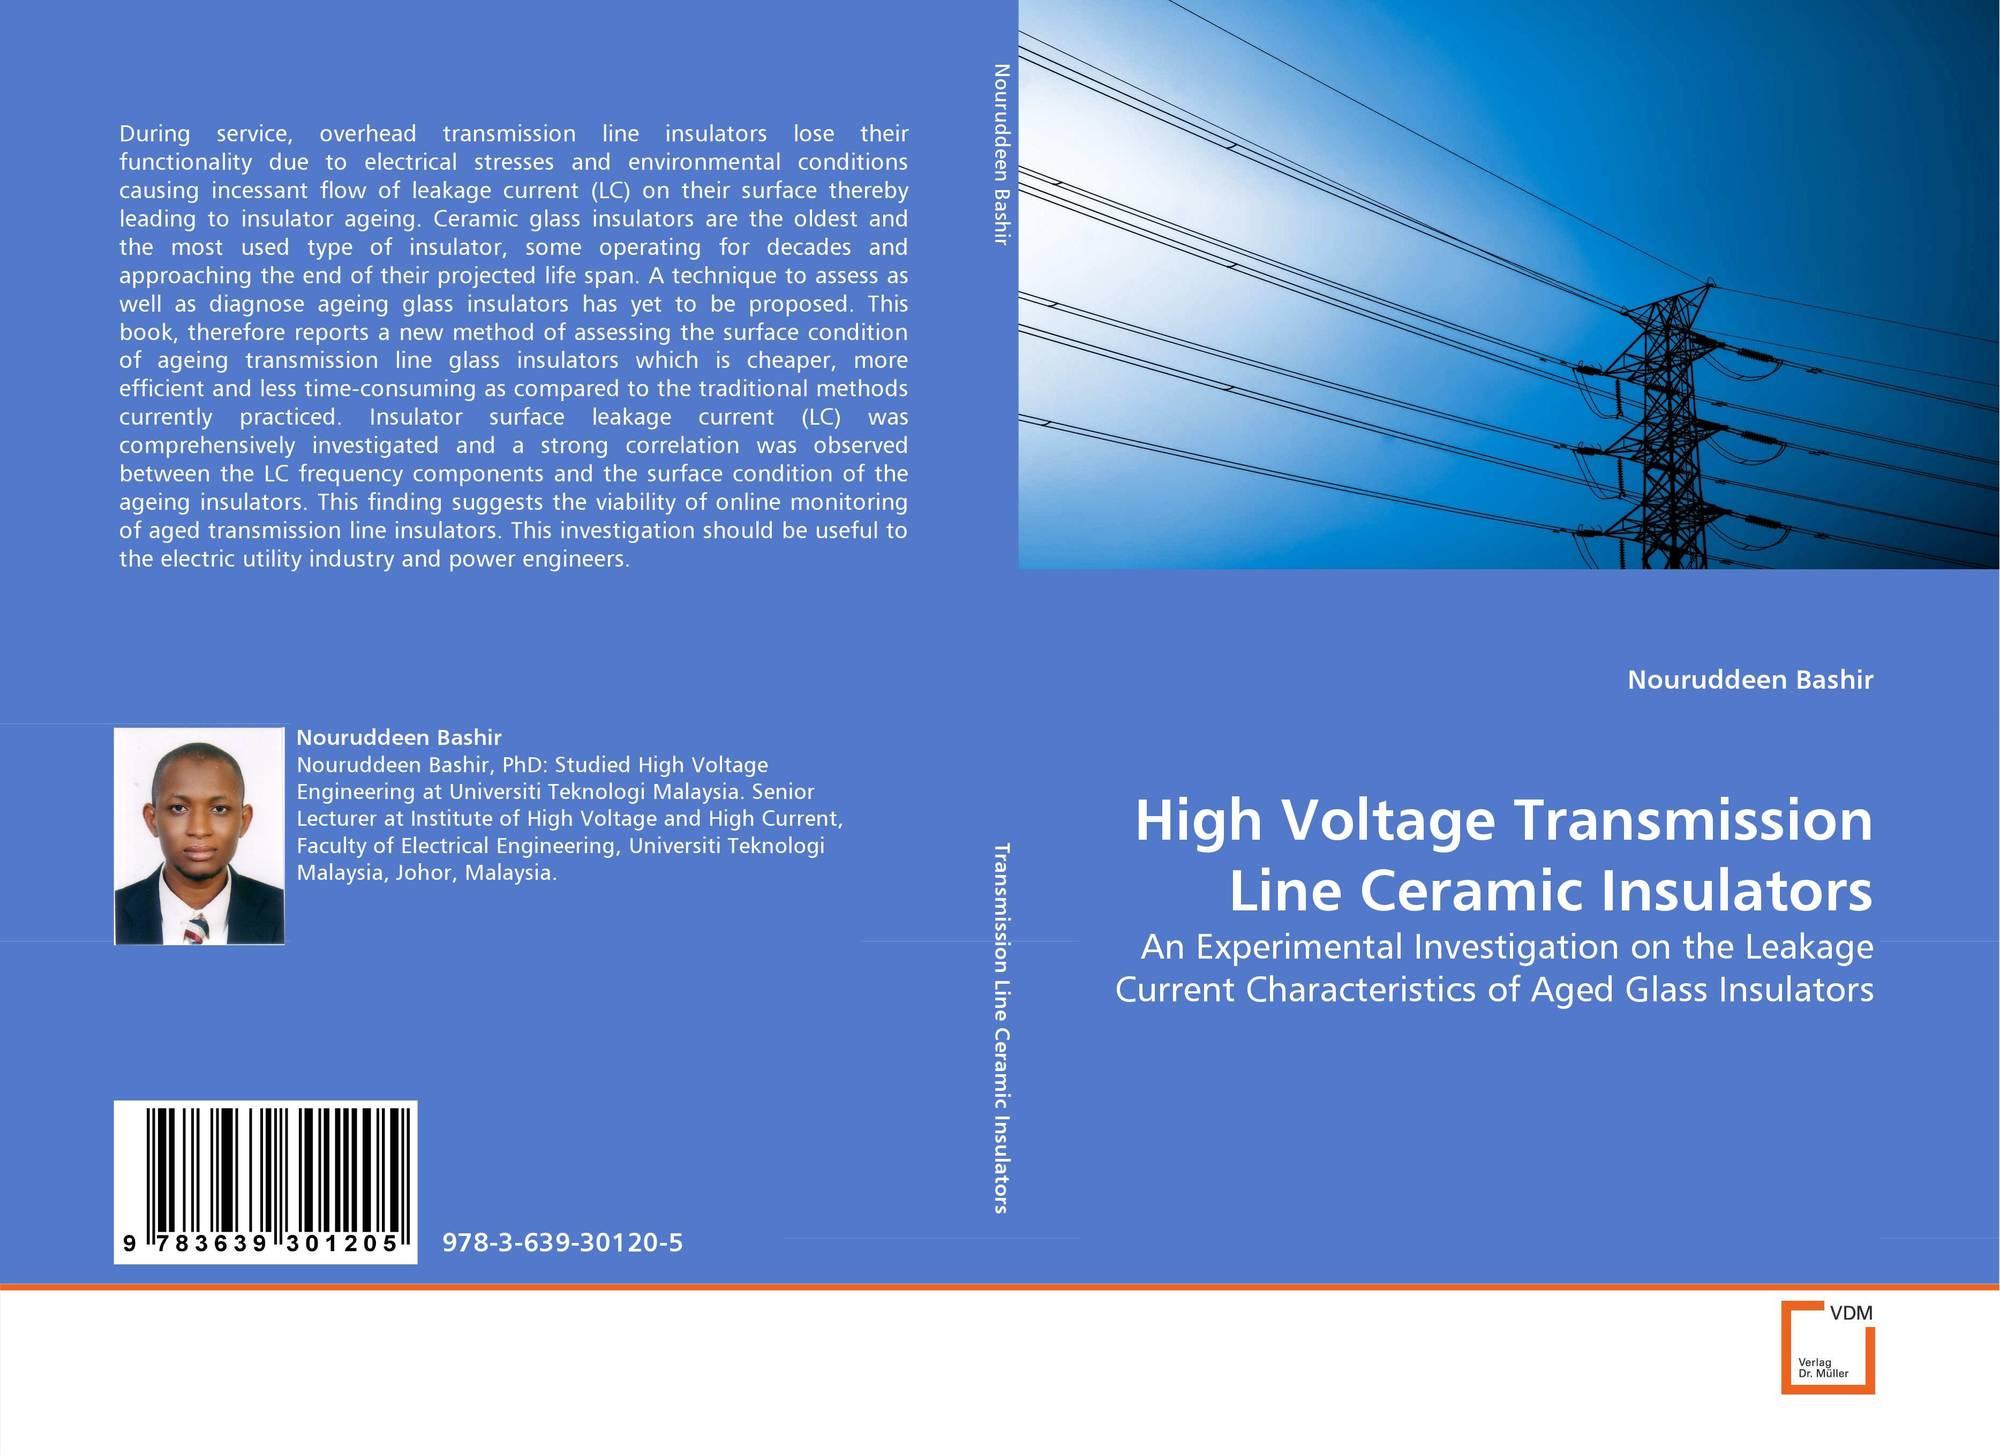 High Voltage Transmission Line Ceramic Insulators 978 3 639 30120 5 363930120x 9783639301205 By Nouruddeen Bashir